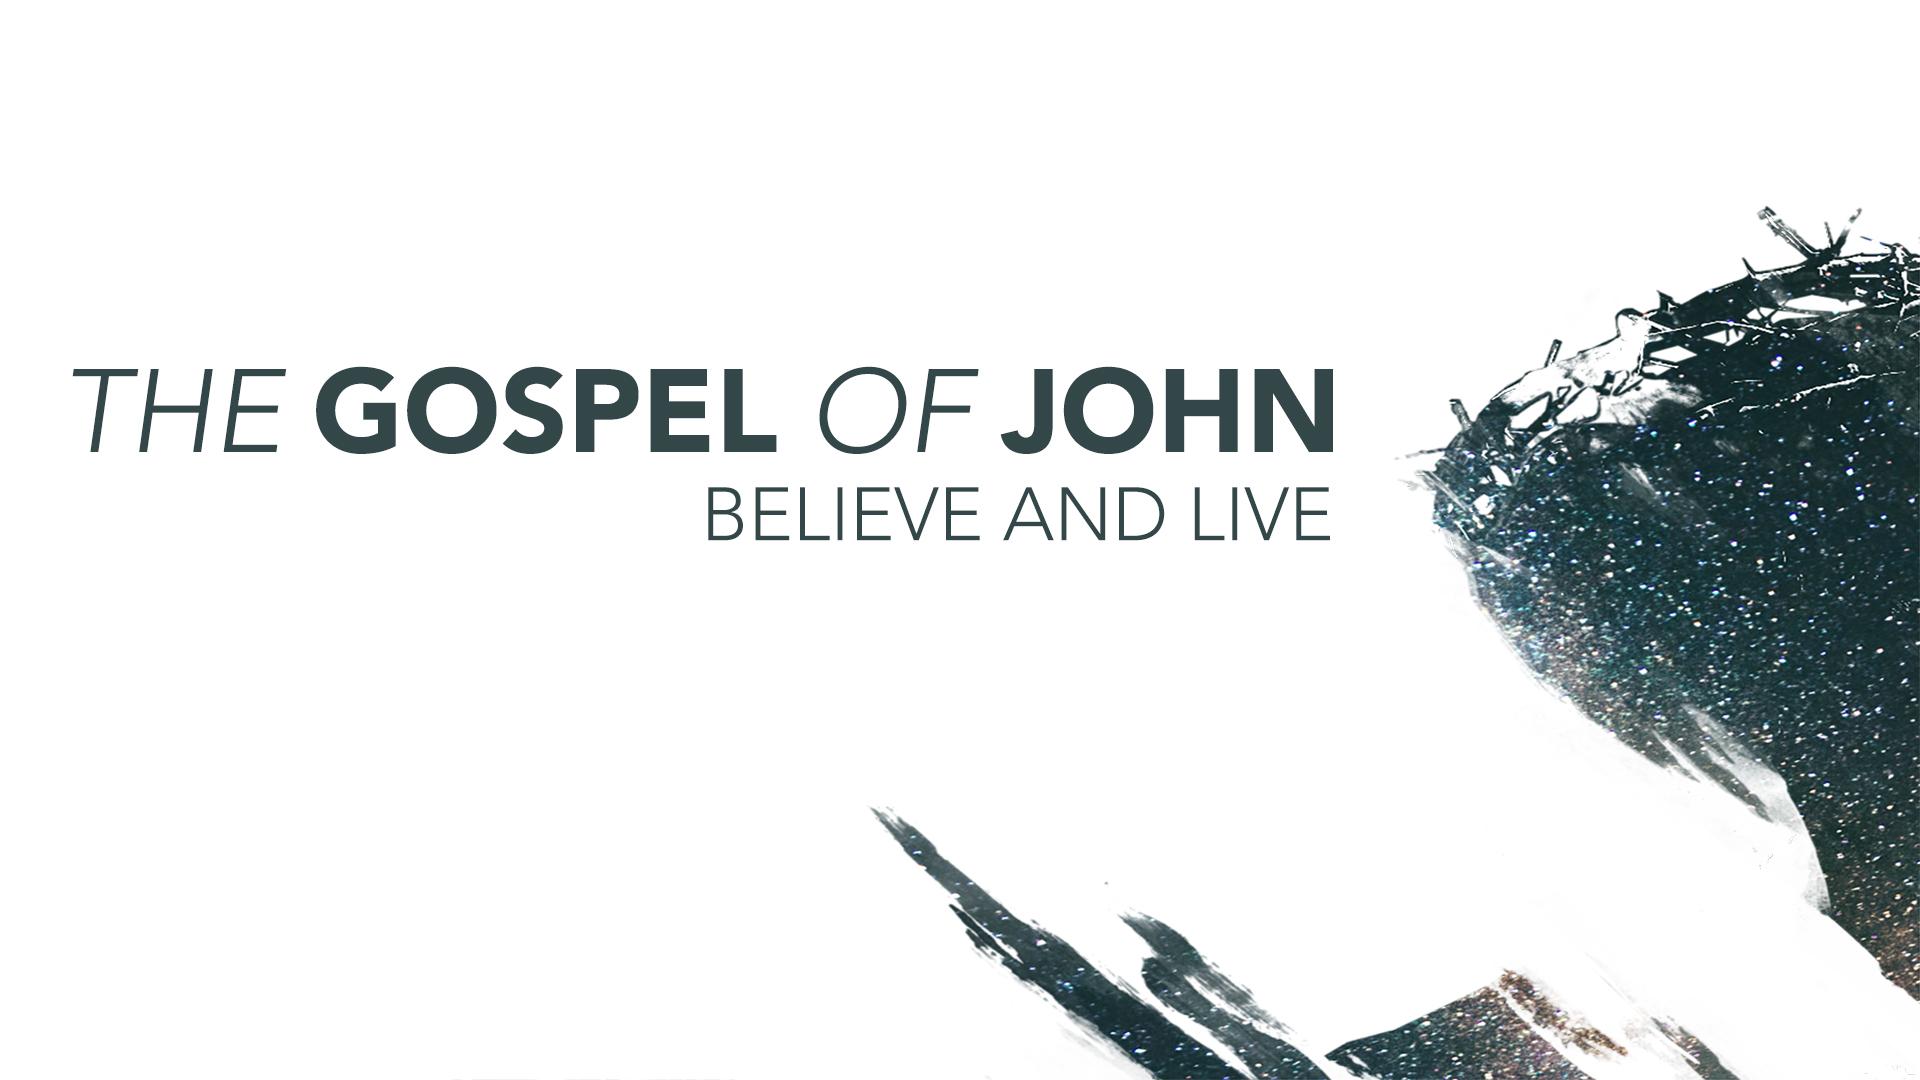 John graphic 1.jpg